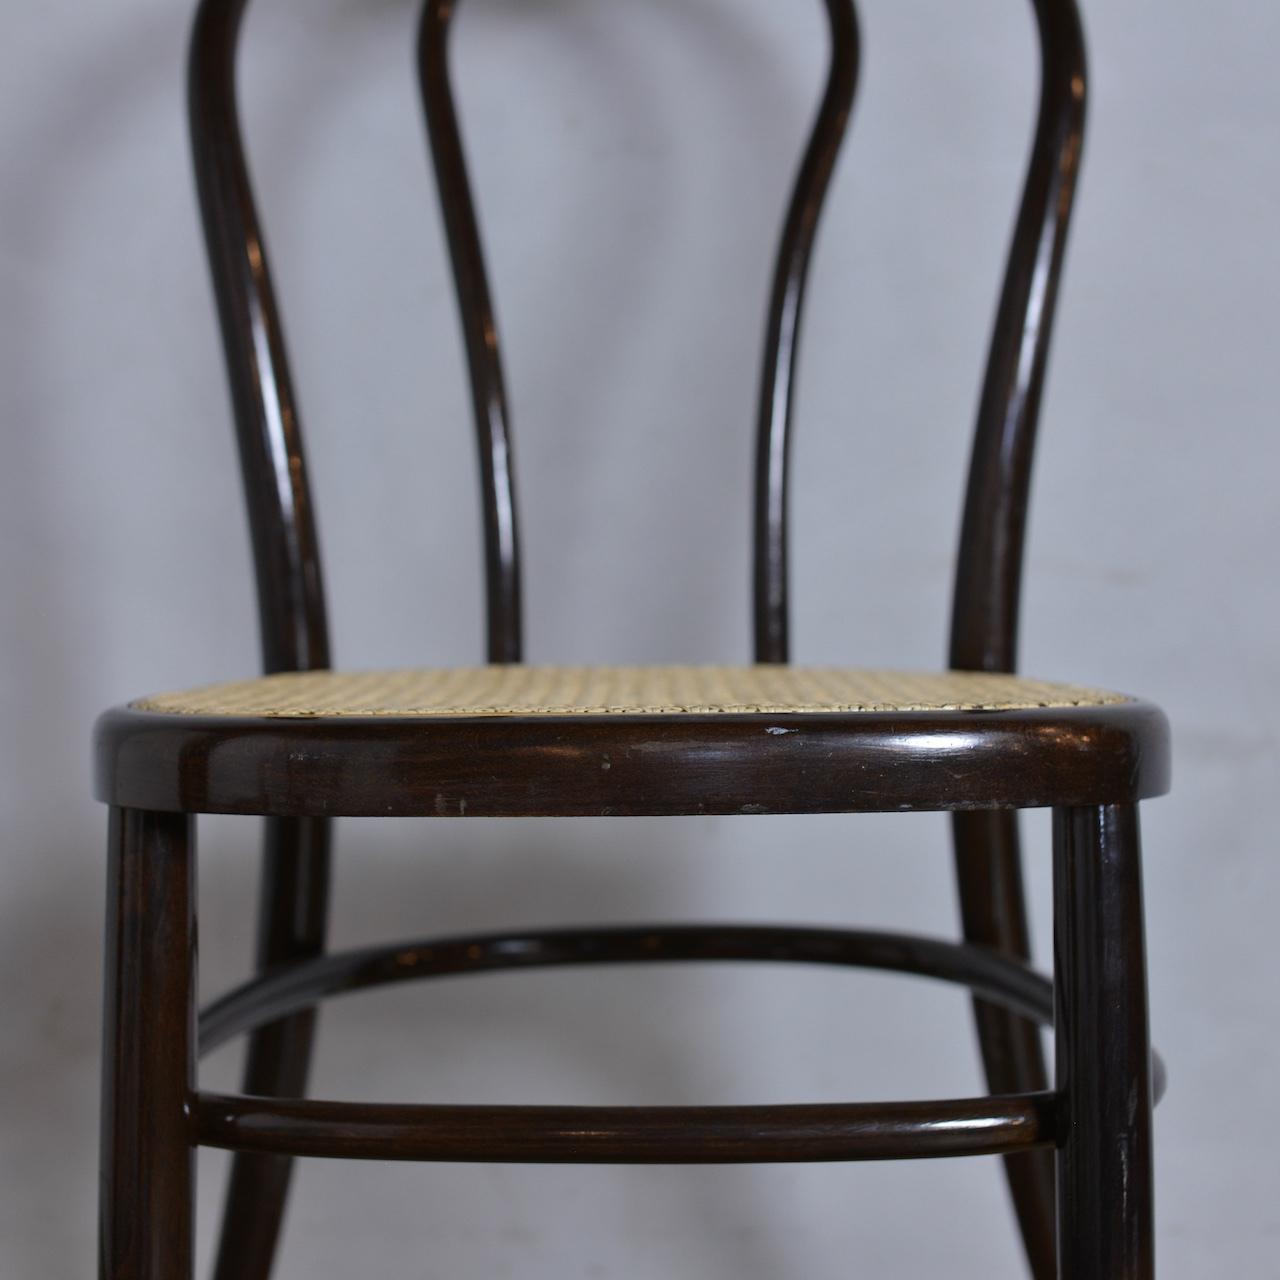 Bentwood Chair / ベントウッド チェア 【B】〈ダイニングチェア・ラタンチェア〉